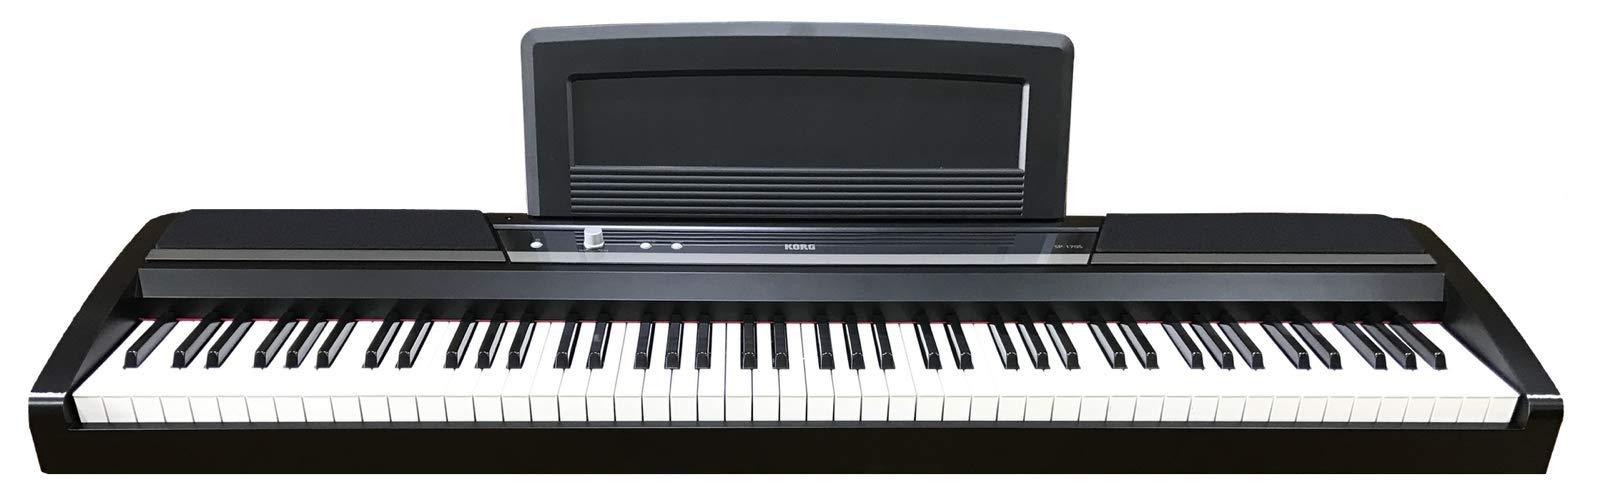 Korg SP170s - 88 - Key Digital Piano in Black by Korg